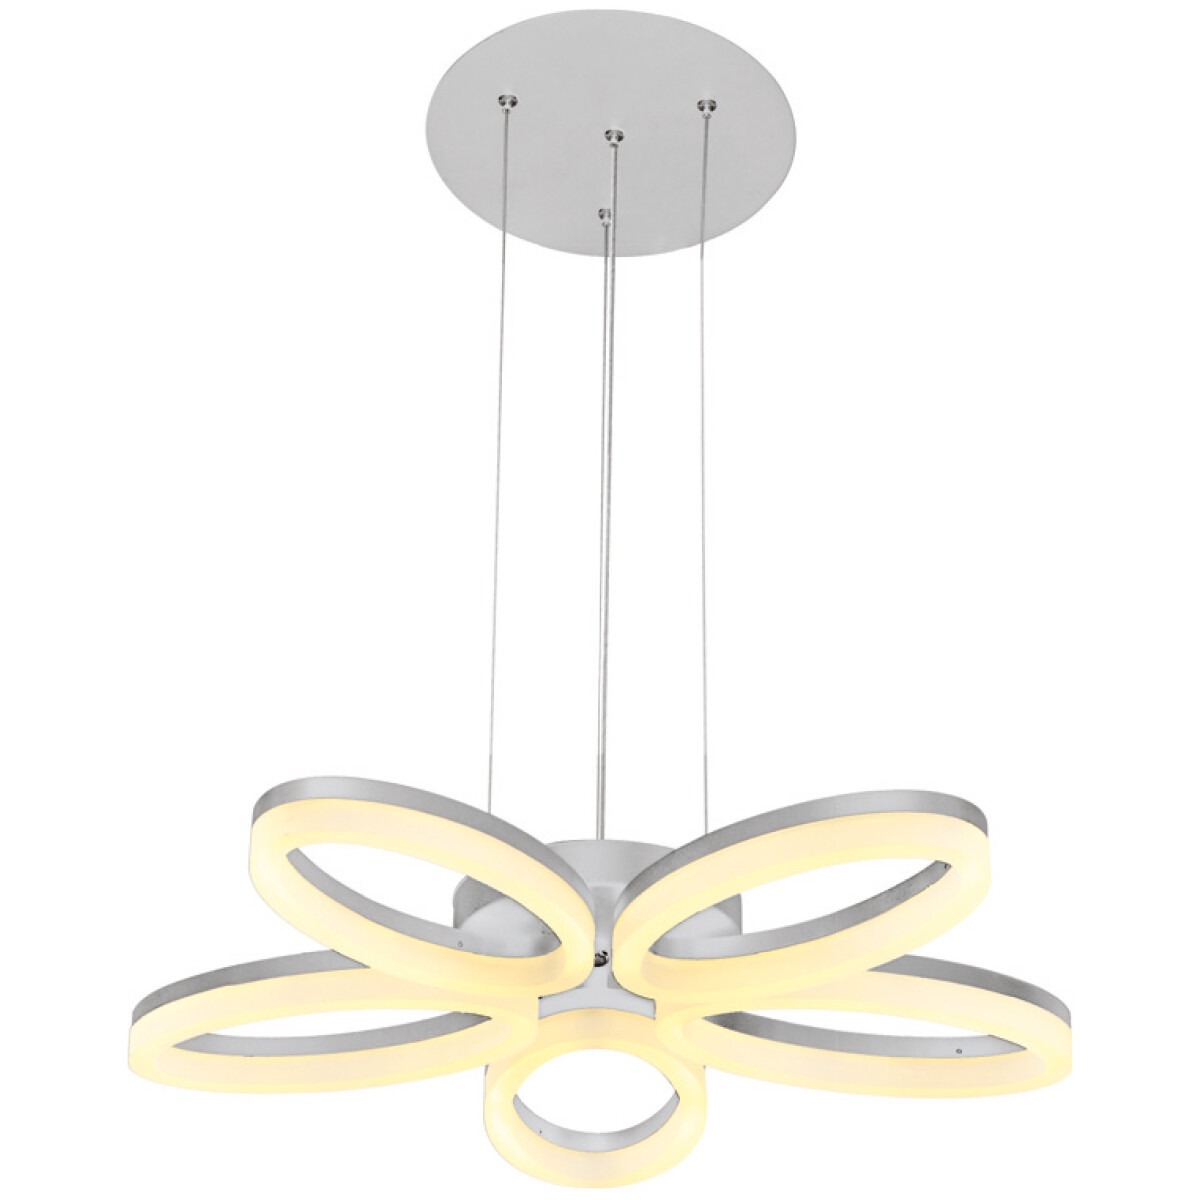 LED Plafondlamp - Plafondverlichting - Luxury - 40W - Natuurlijk Wit 4000K - Wit Aluminium